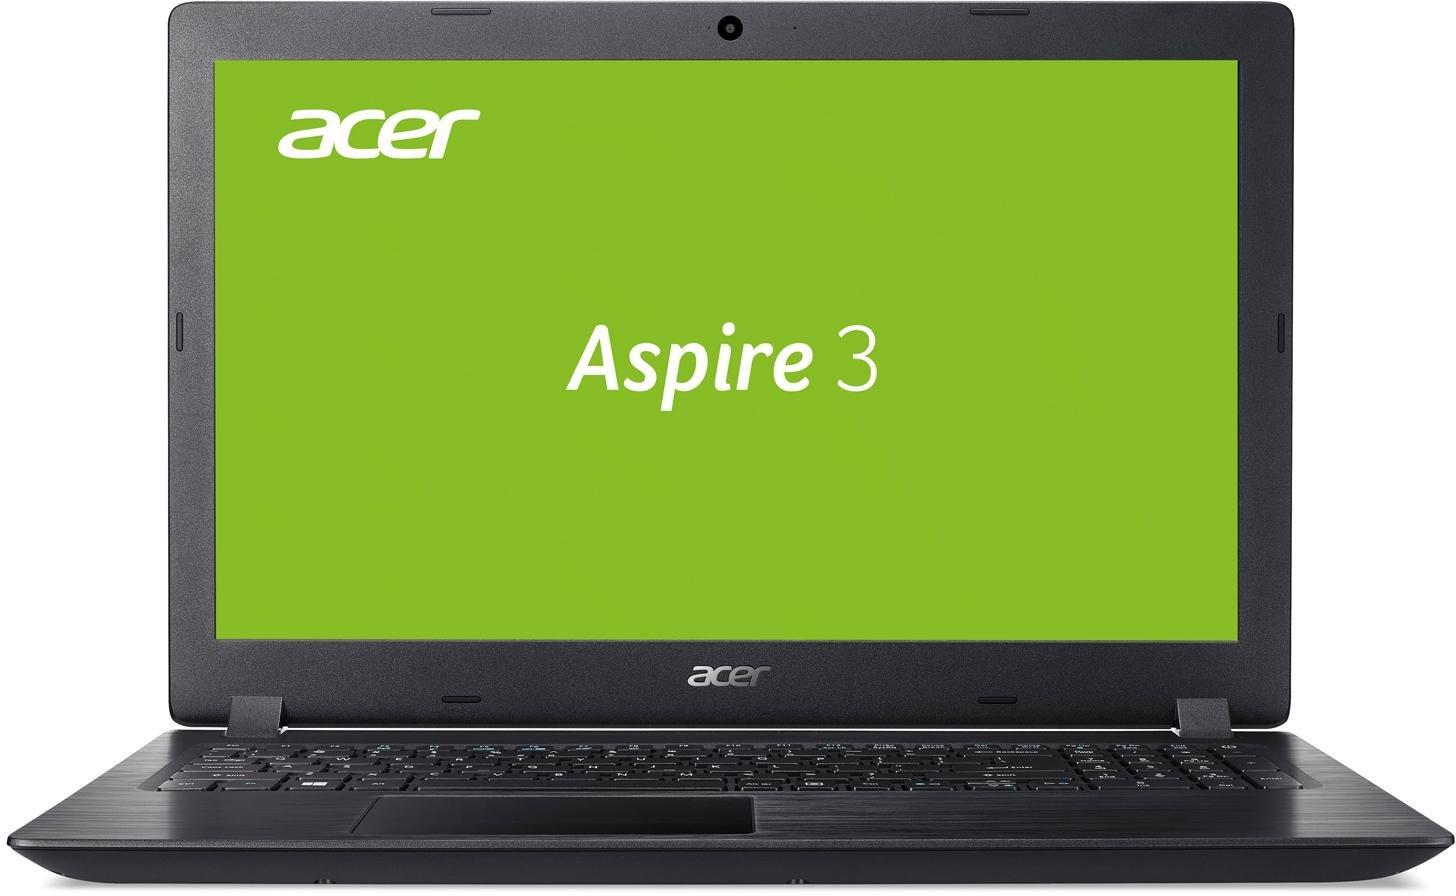 Acer Aspire 3 A315-51 (NX.GNPEL.005)